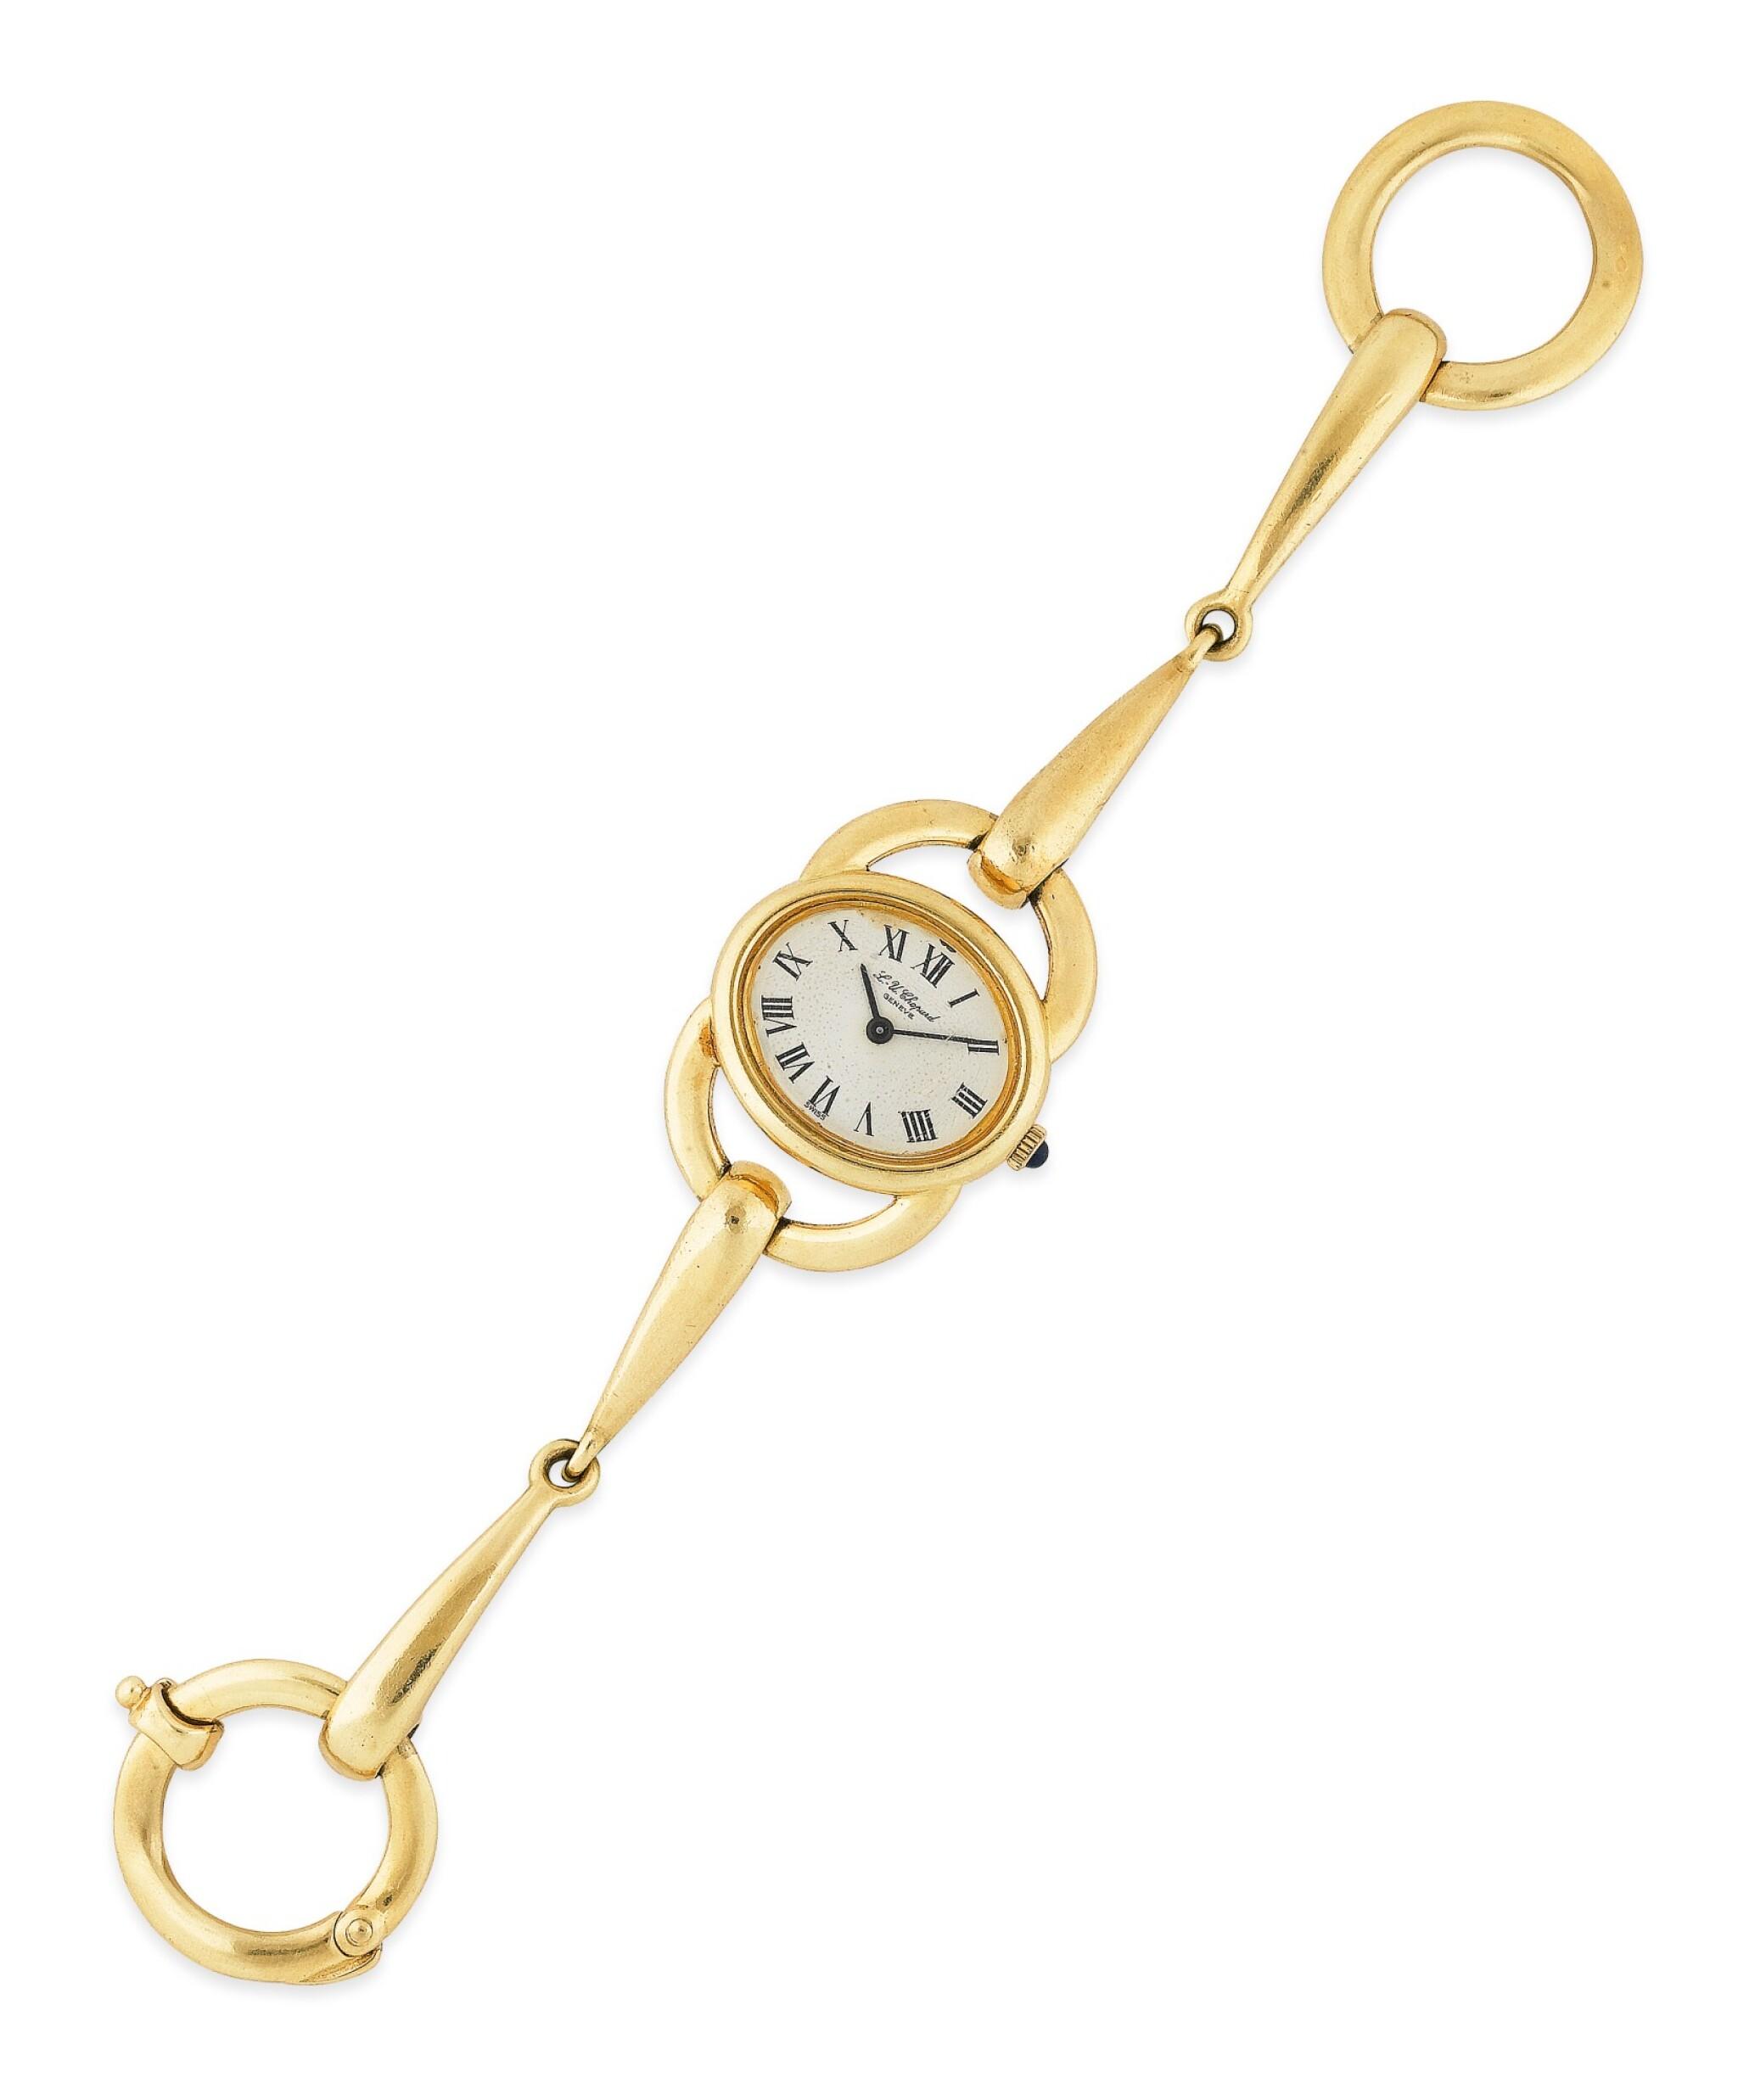 View full screen - View 1 of Lot 143. Montre bracelet de dame or | Lady's gold bracelet watch.